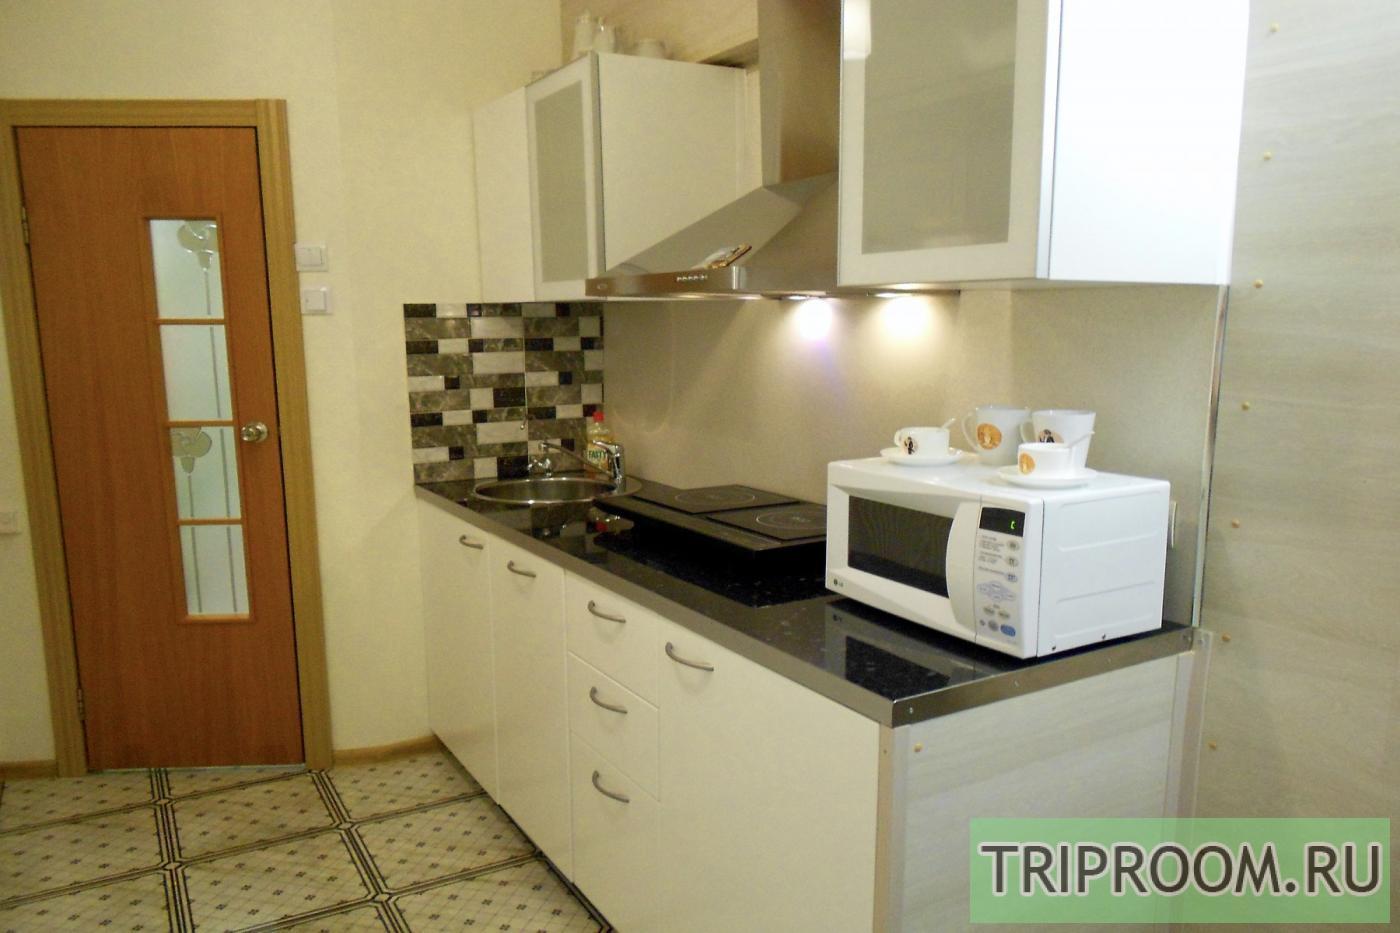 2-комнатная квартира посуточно (вариант № 23442), ул. Невский проспект, фото № 7